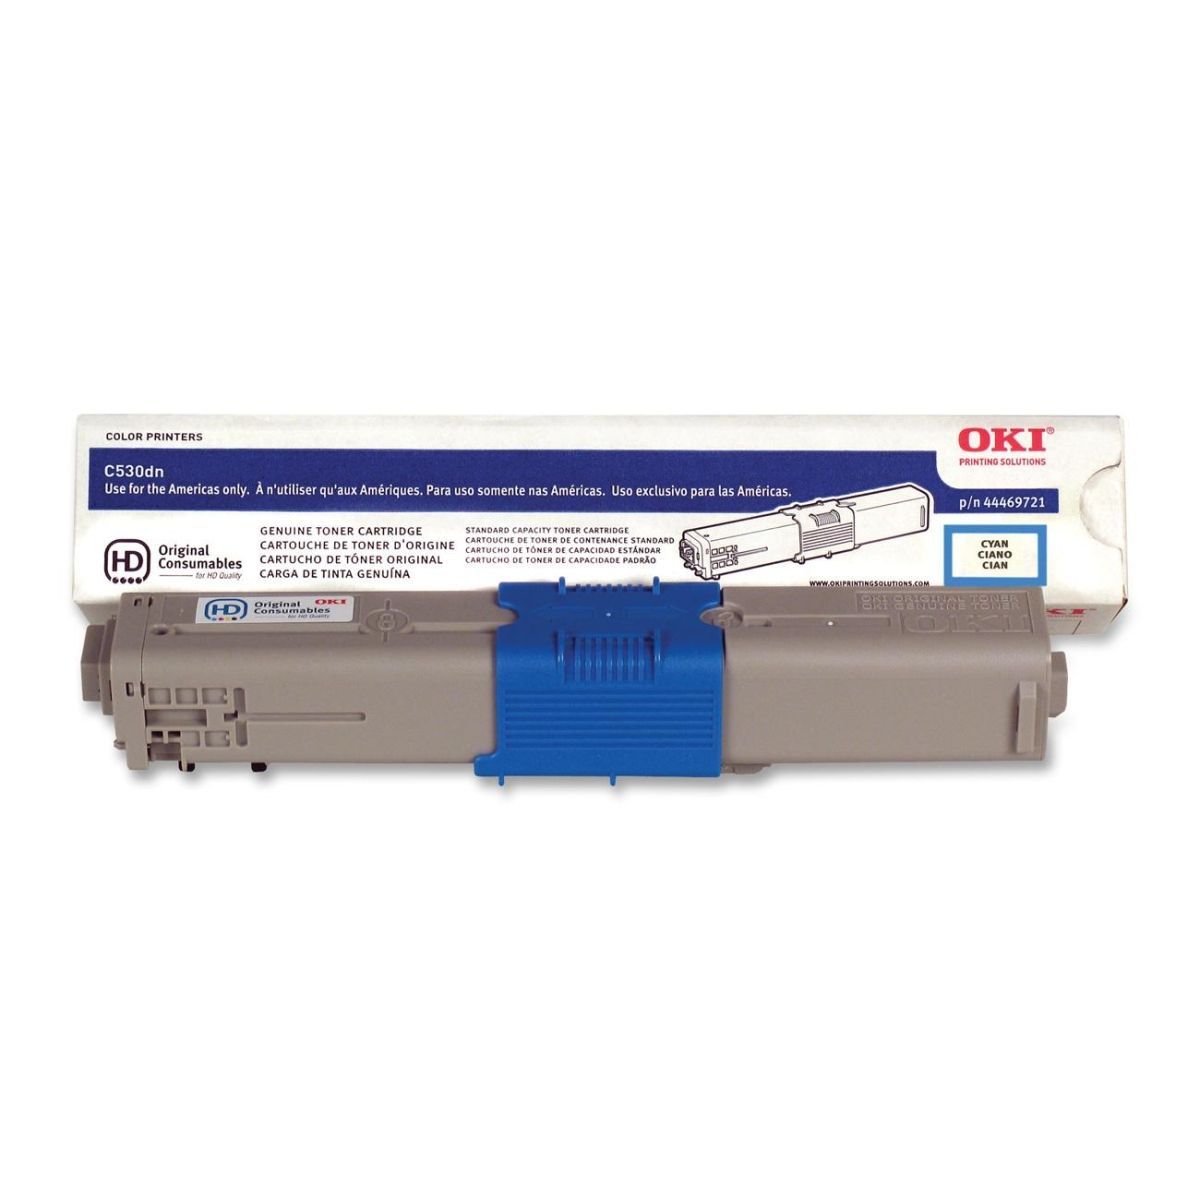 OKI Type C17 - High Capacity - cyan - original - toner cartridge - for OKI MC562dnw MC562w; C530dn 531dn; COREFIDO MC561DN